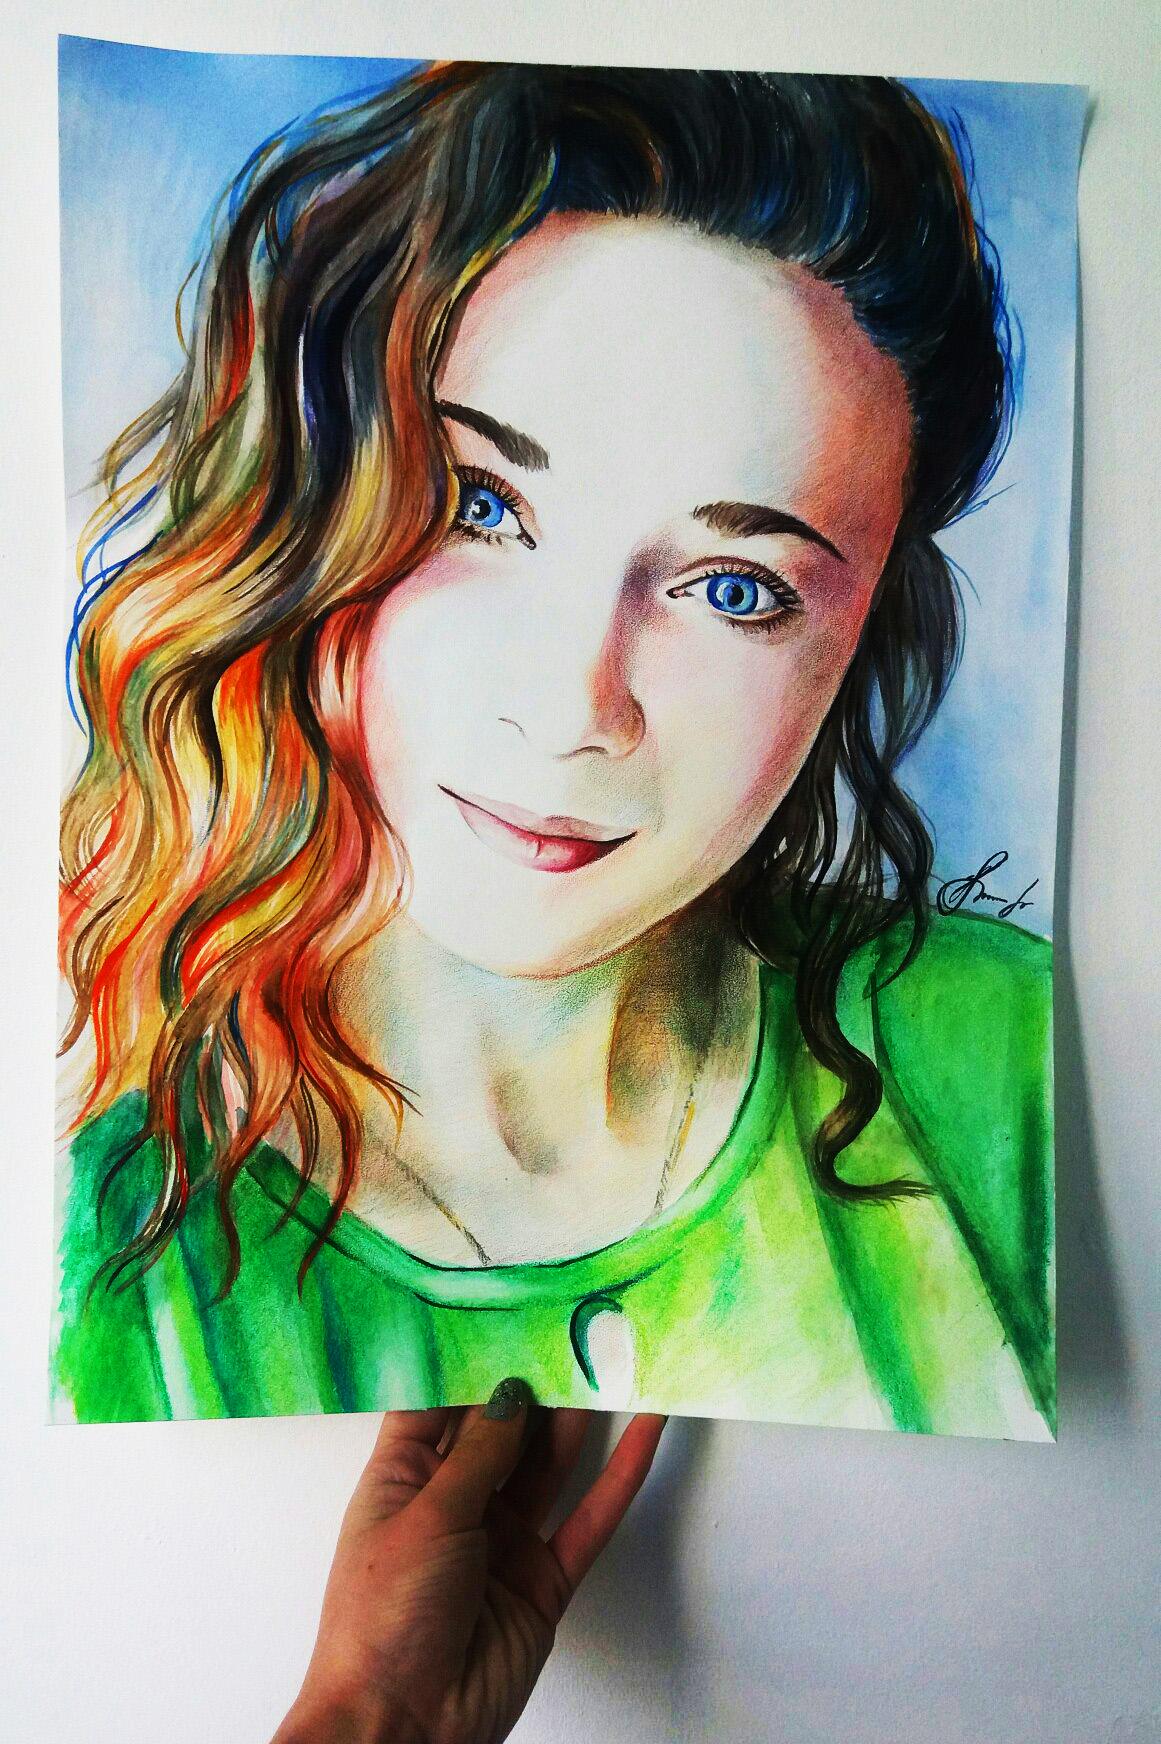 2zJWR9rlKIE Реалистичный портрет (красками)